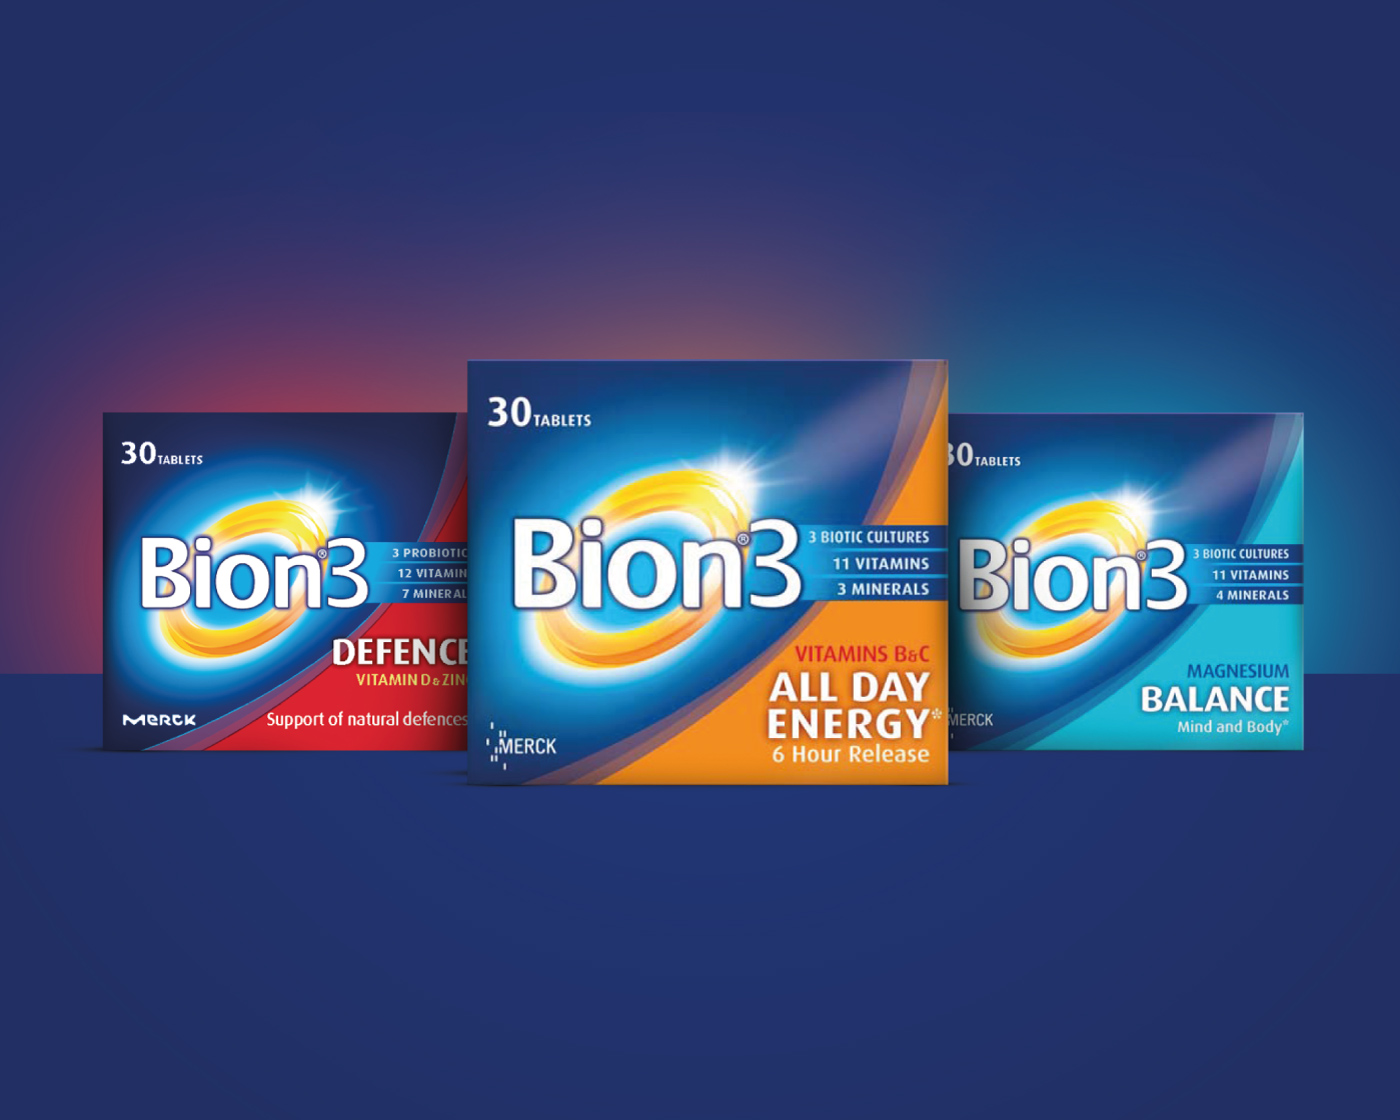 Bion-2